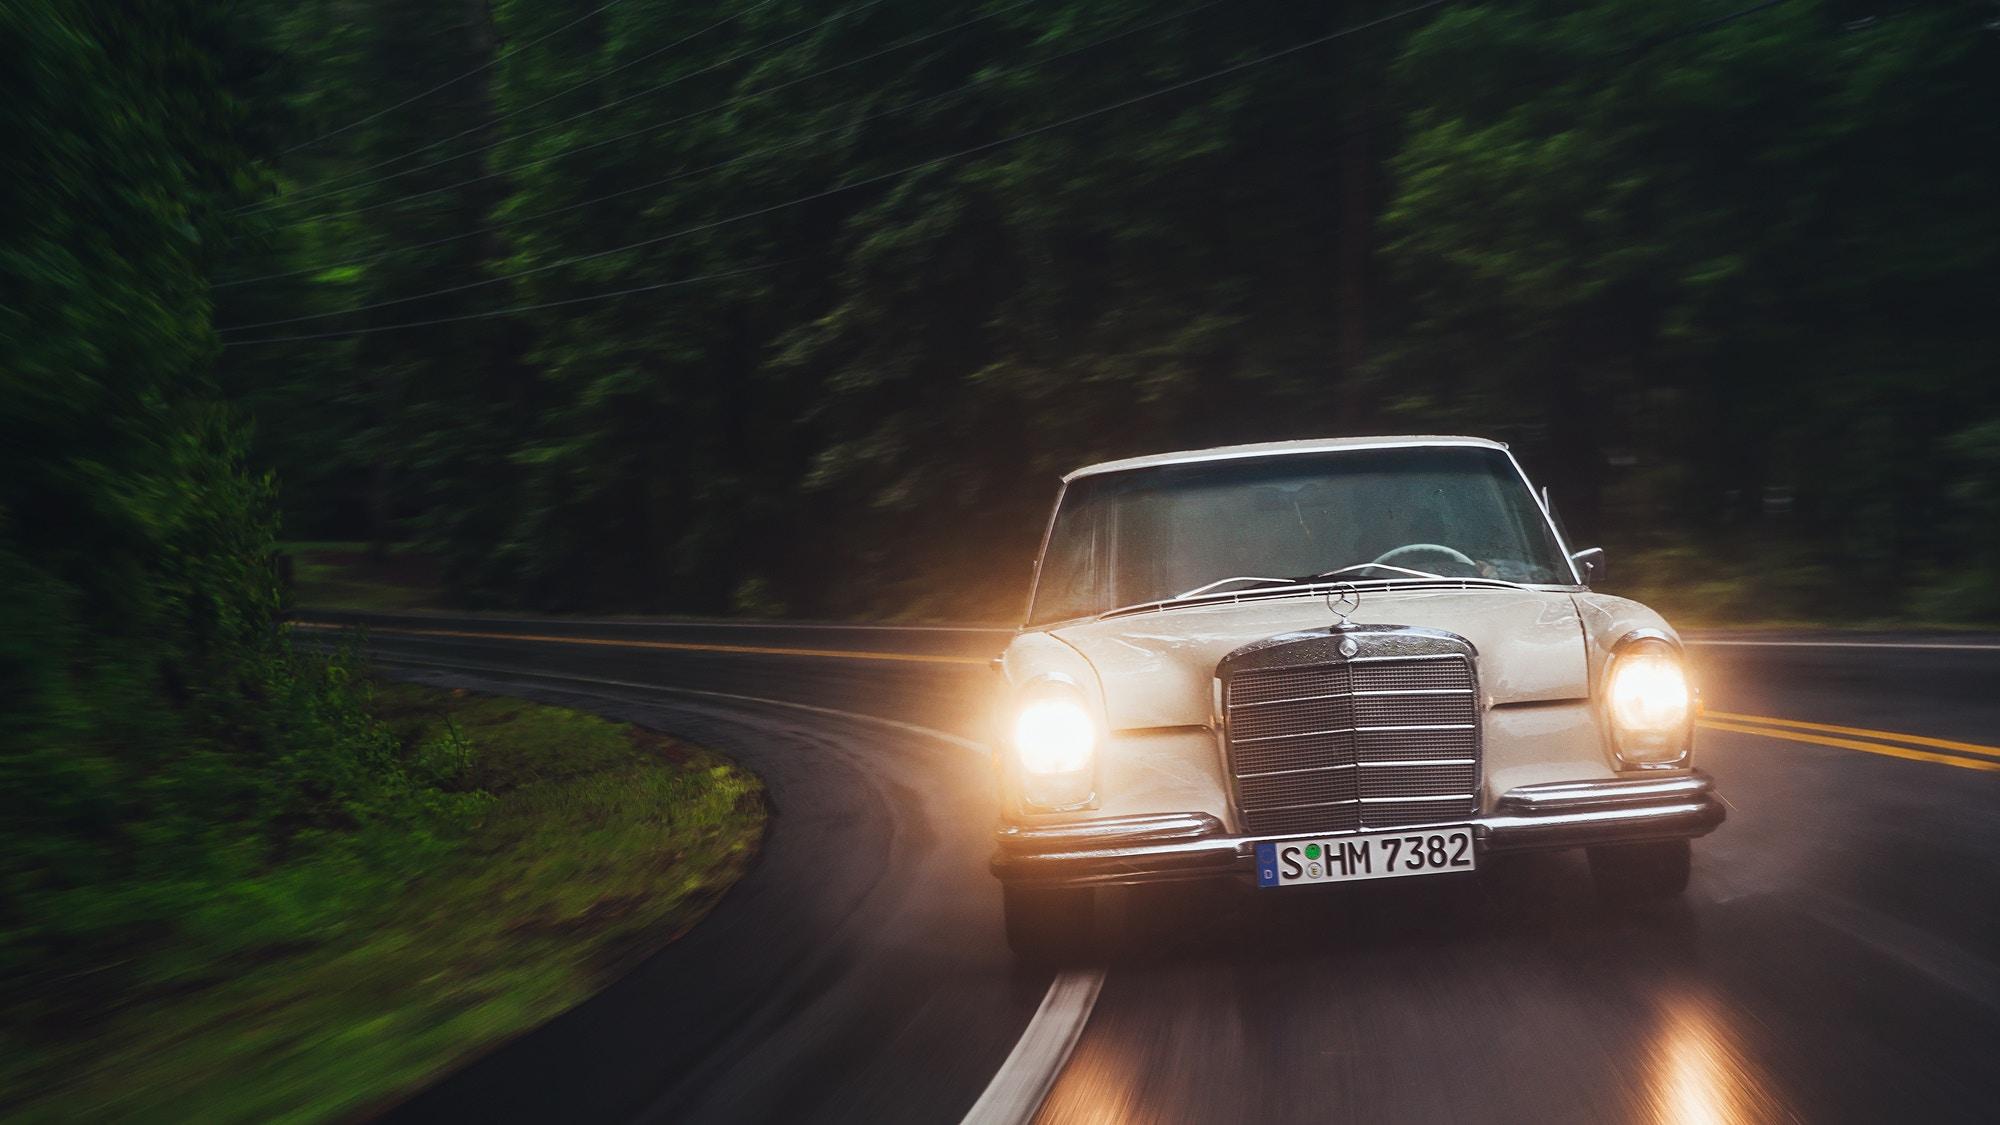 matthew-jones-automotive-photography-mereceds-benz-280d-through-winding-blue-ridge-parkway-1726387.jpg